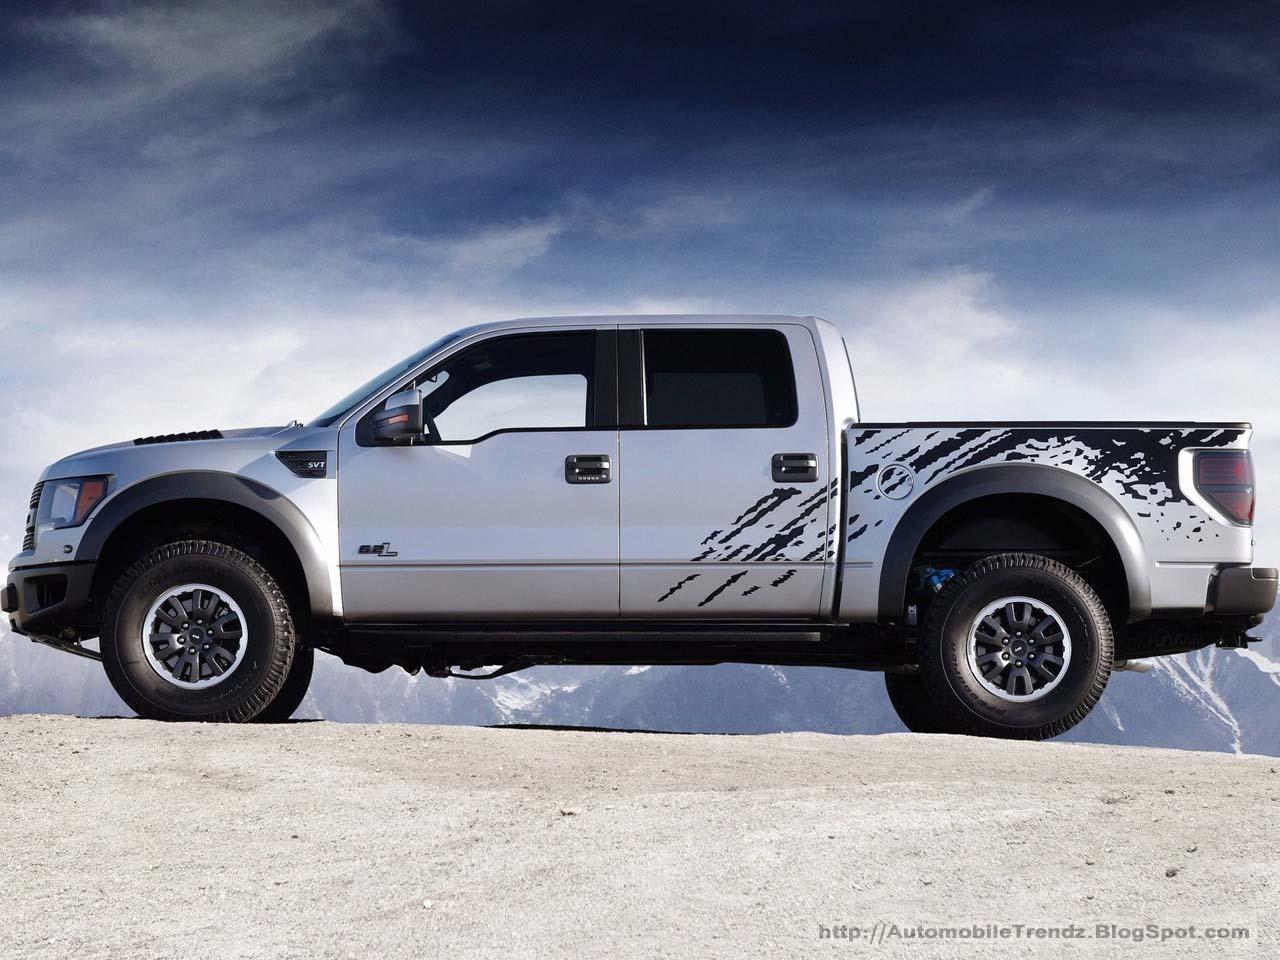 Automobile Trendz Ford Raptor Wallpaper 1280x960